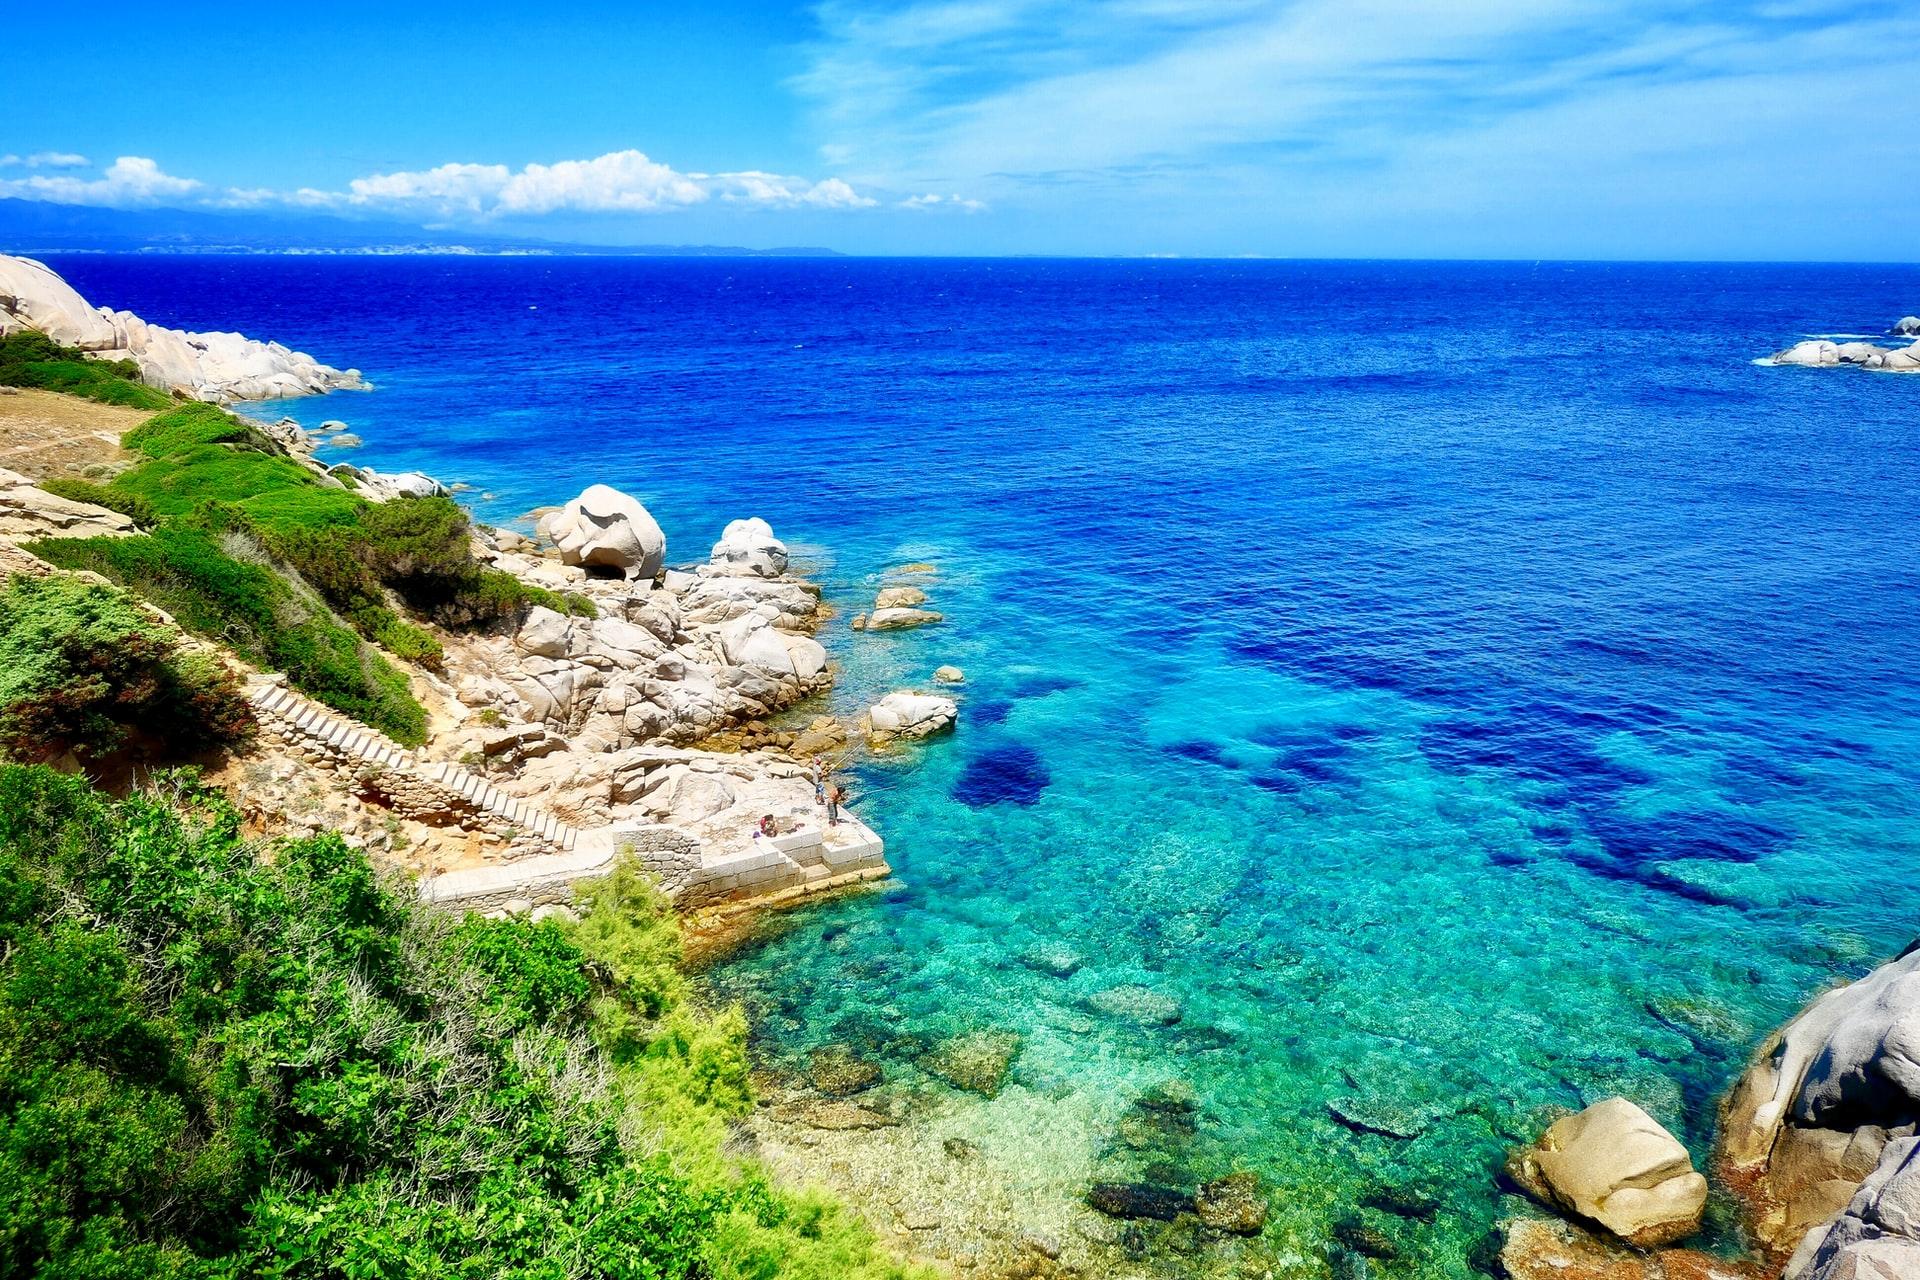 The stunning Mediterranean islands The endless blue of Capo Testa at Santa Teresa di Gallura